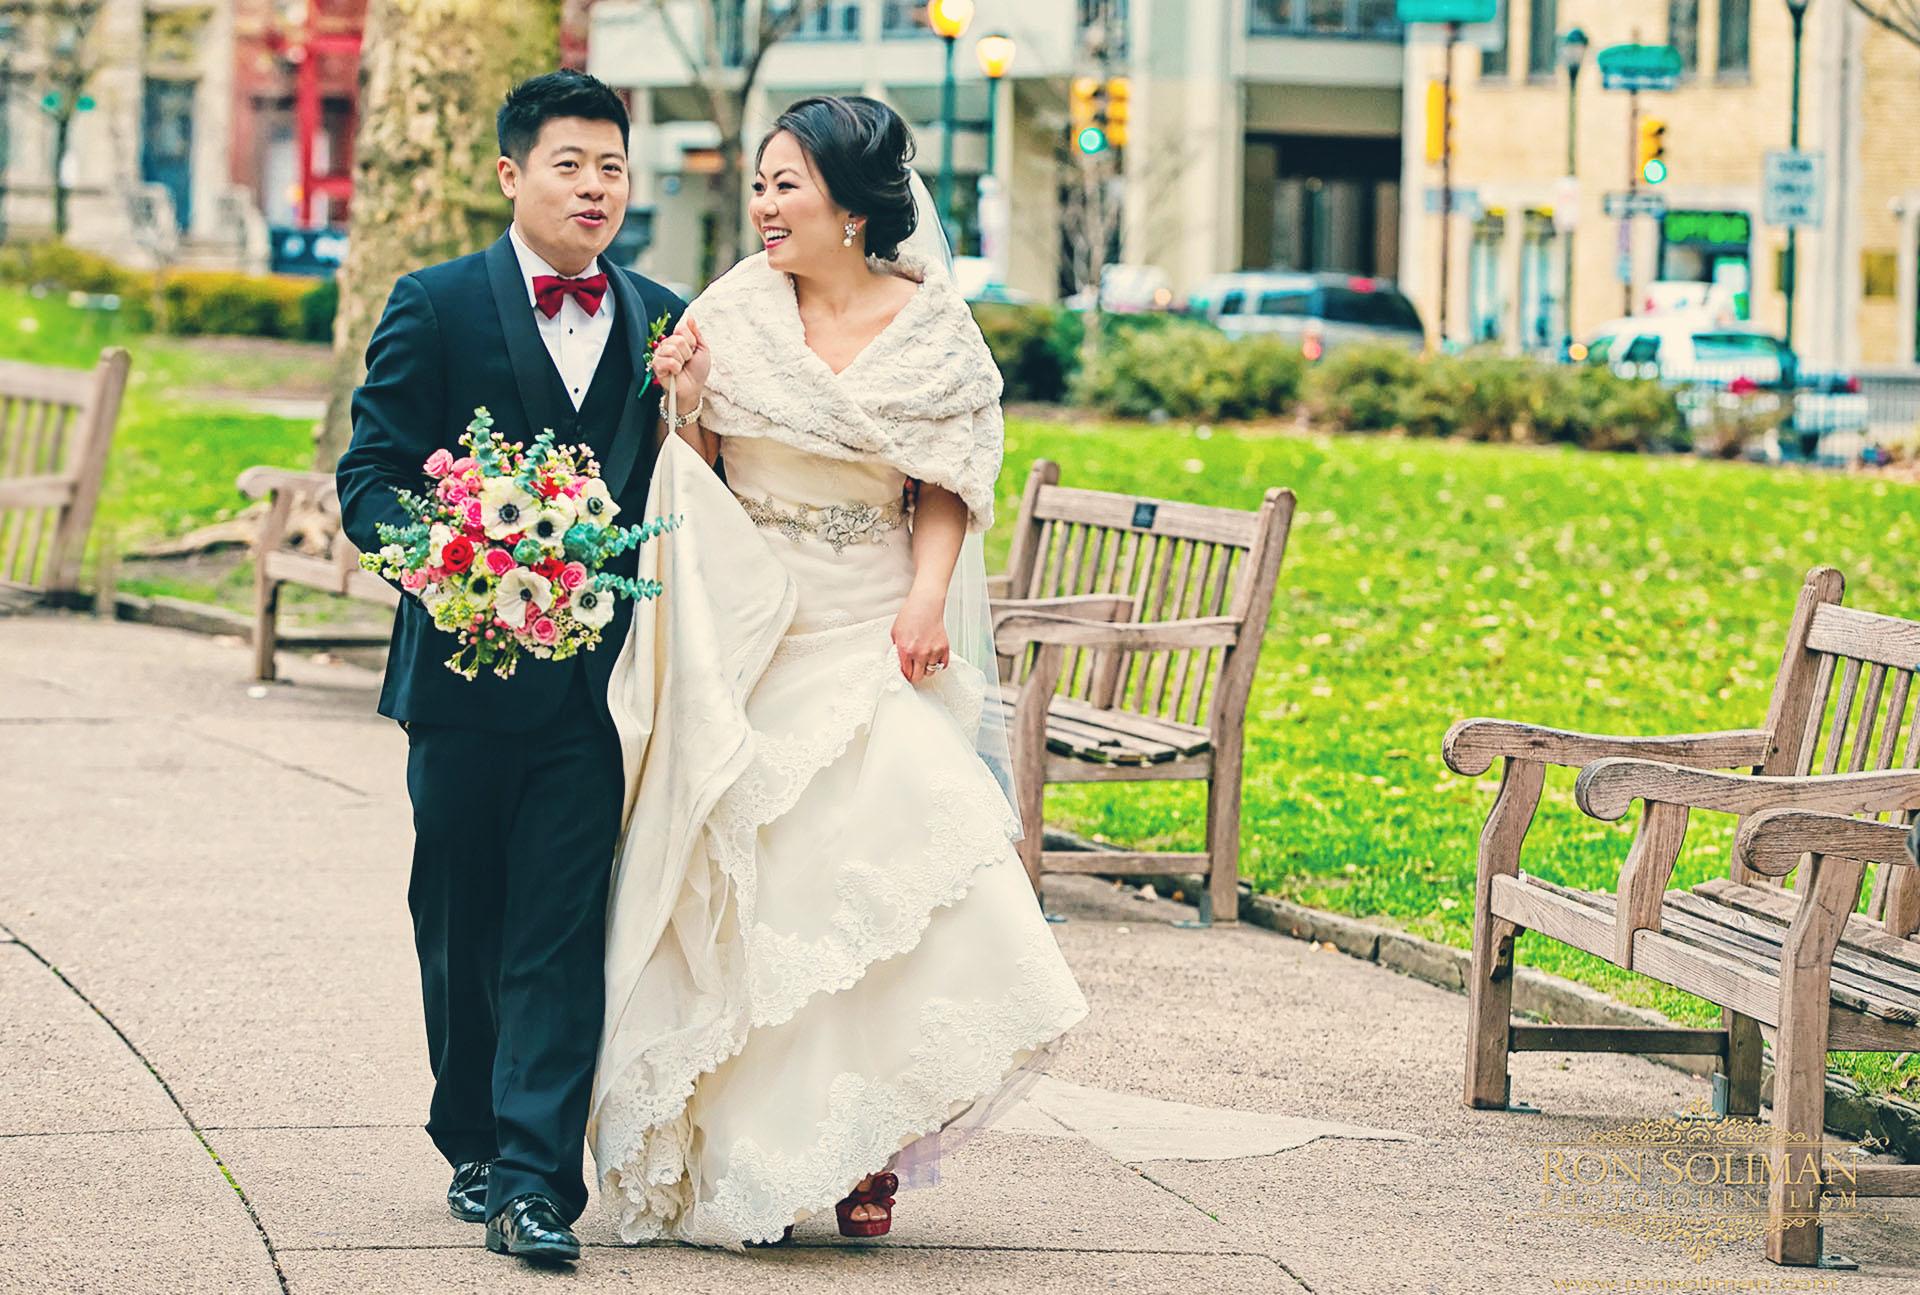 Rittenhouse square wedding